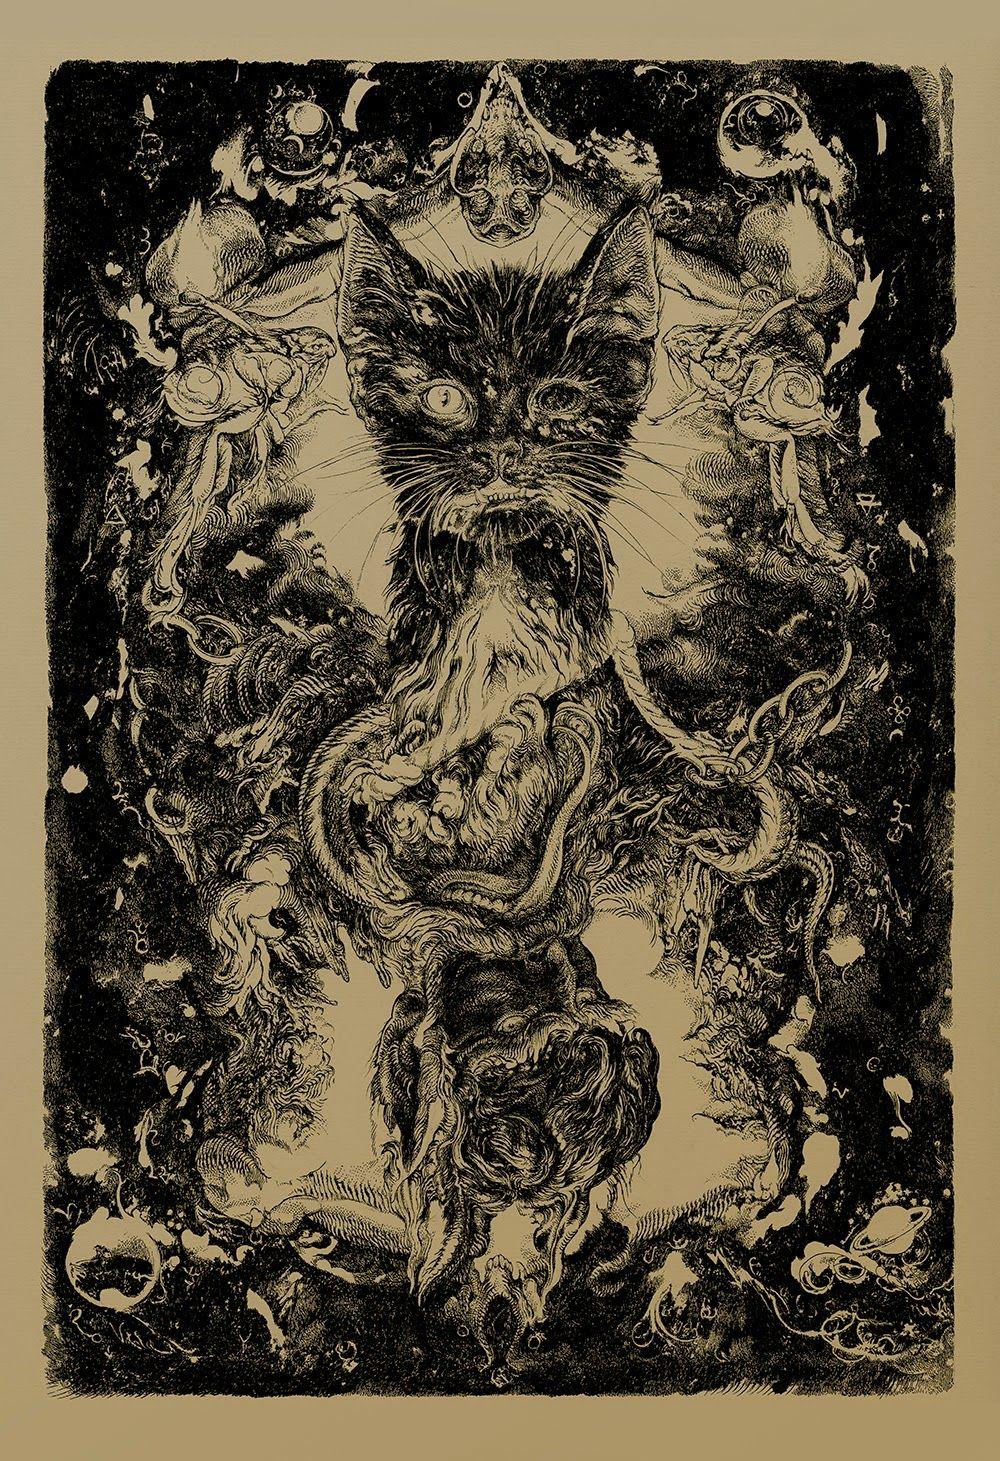 vania cat zouravliov dark cool poe edgar dragon allan prints artwork poster release decay artist cats grey watercolor press